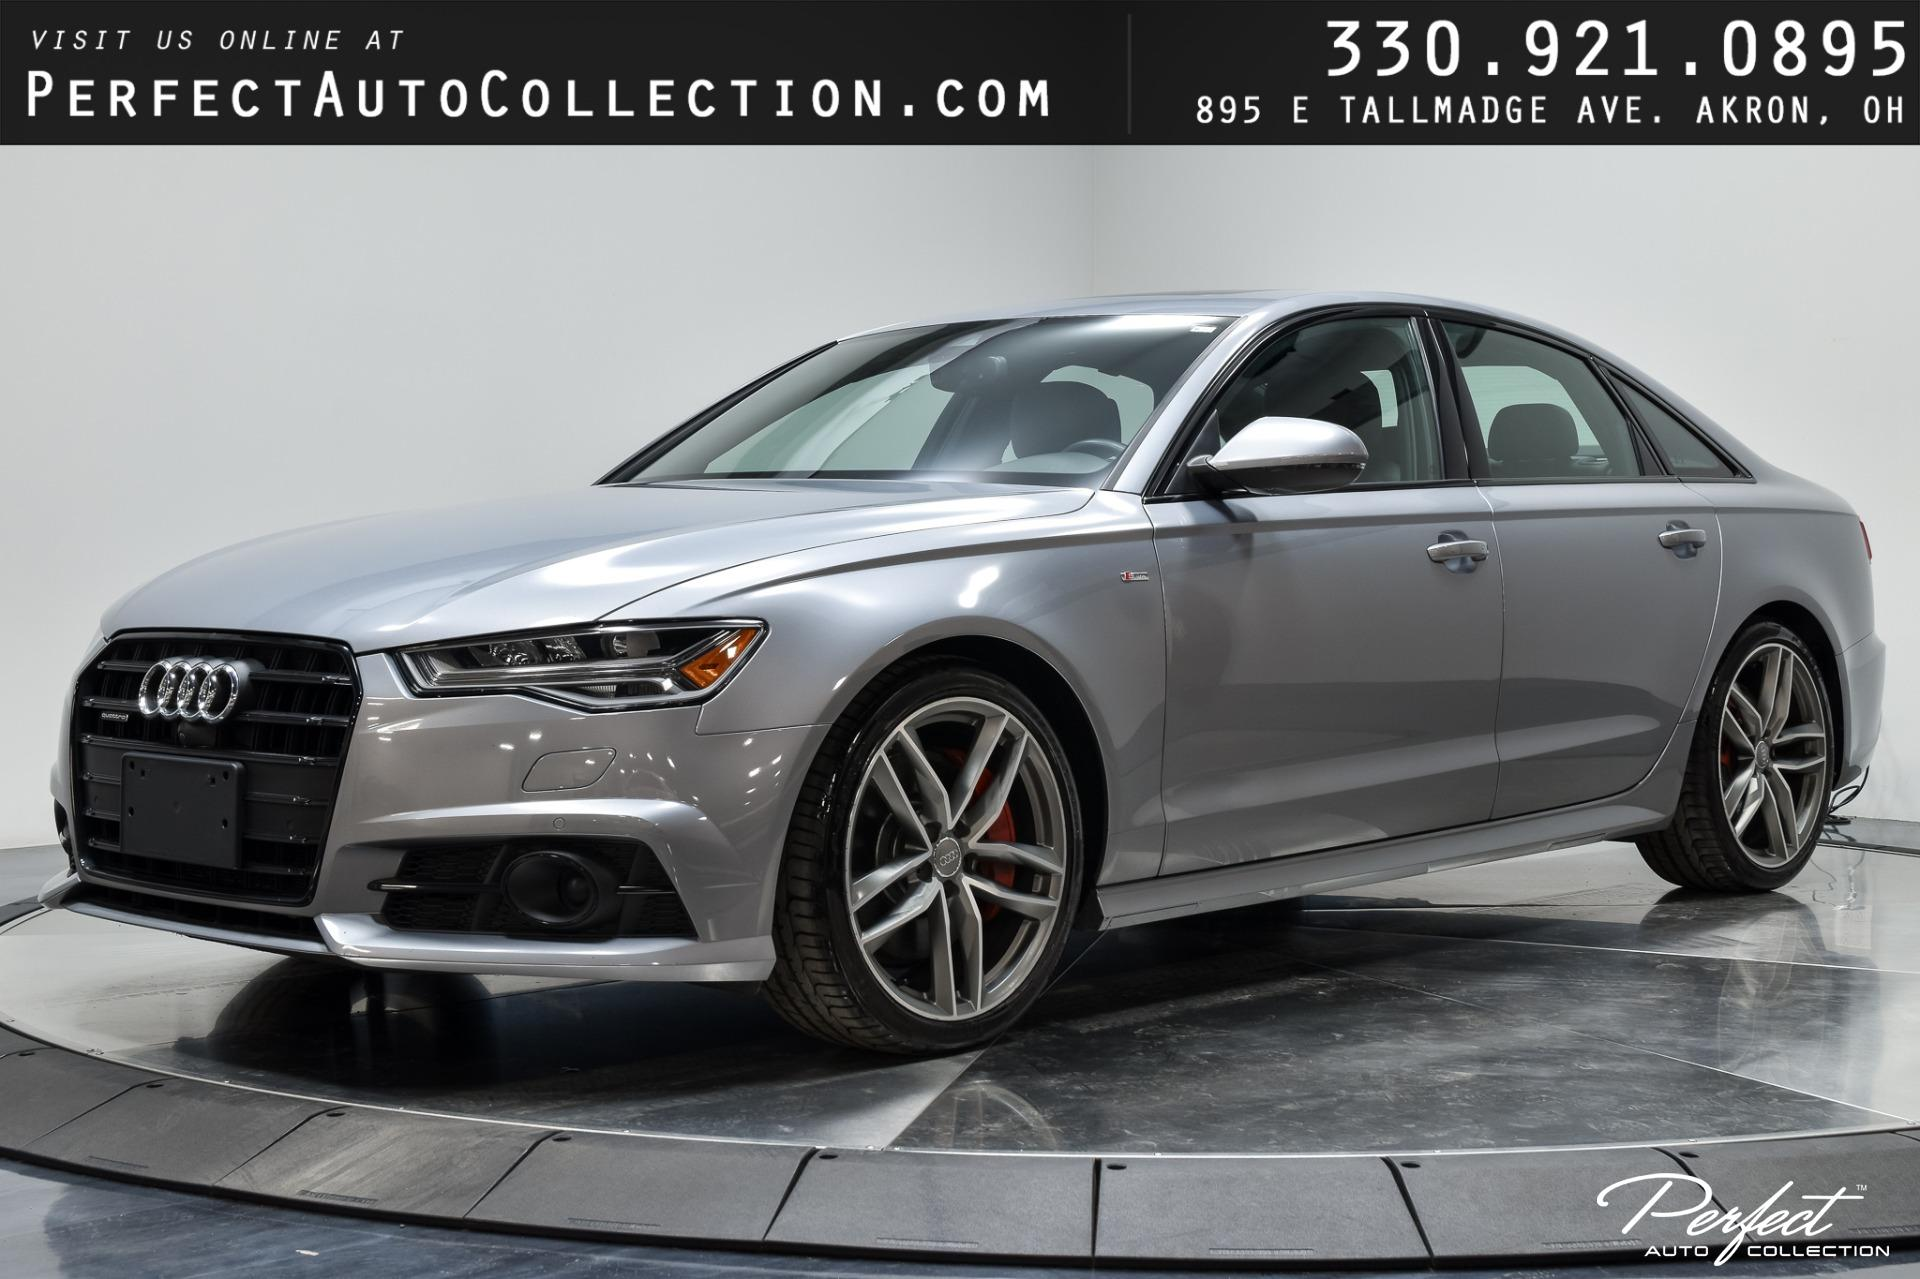 Used 2017 Audi A6 3.0T quattro Prestige Technik for sale $35,995 at Perfect Auto Collection in Akron OH 44310 1